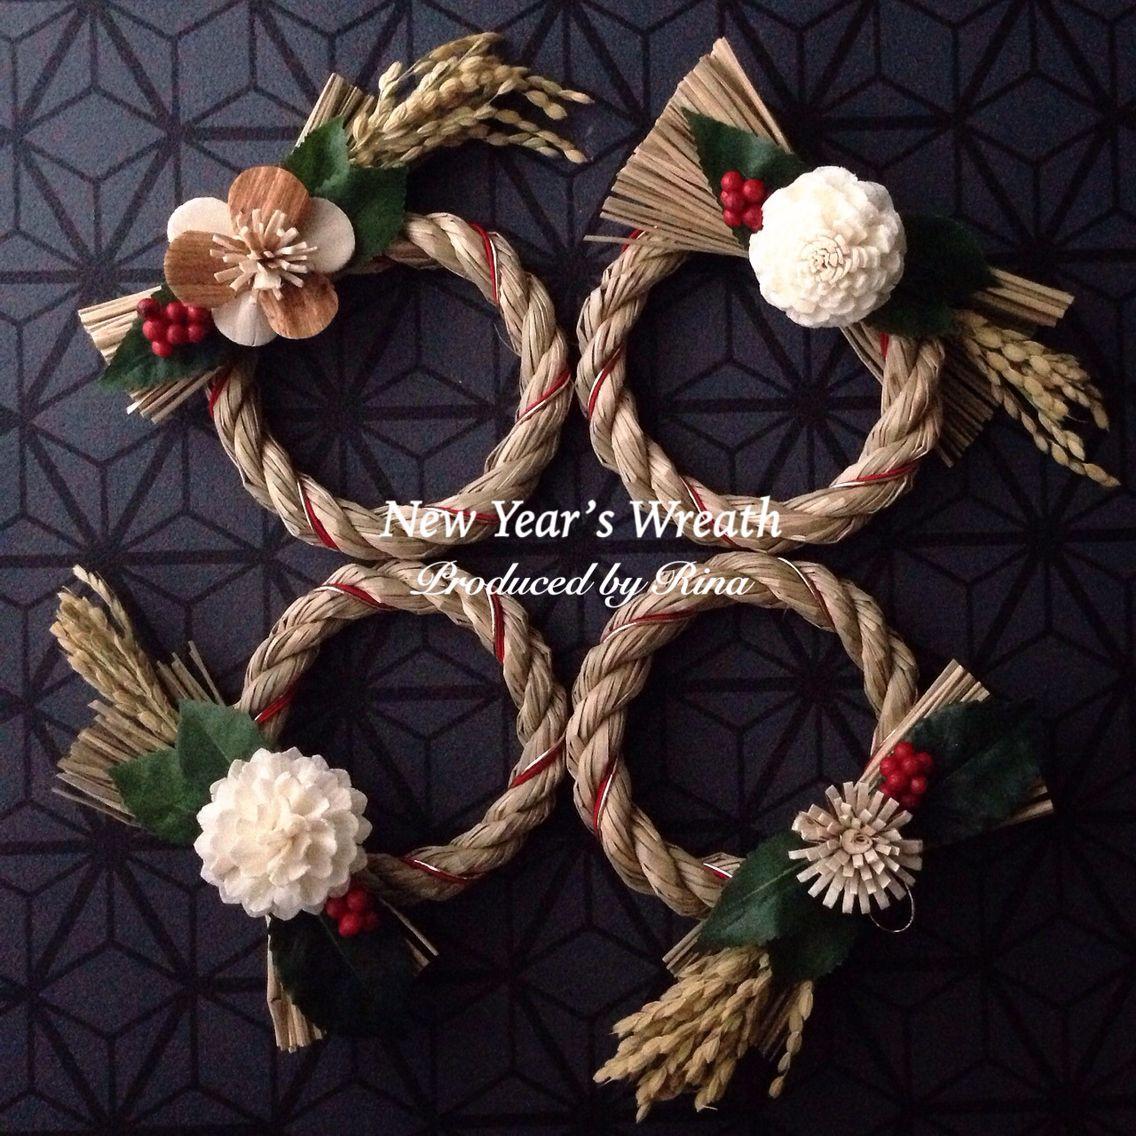 2016 New Year's Wreath φ8㎝